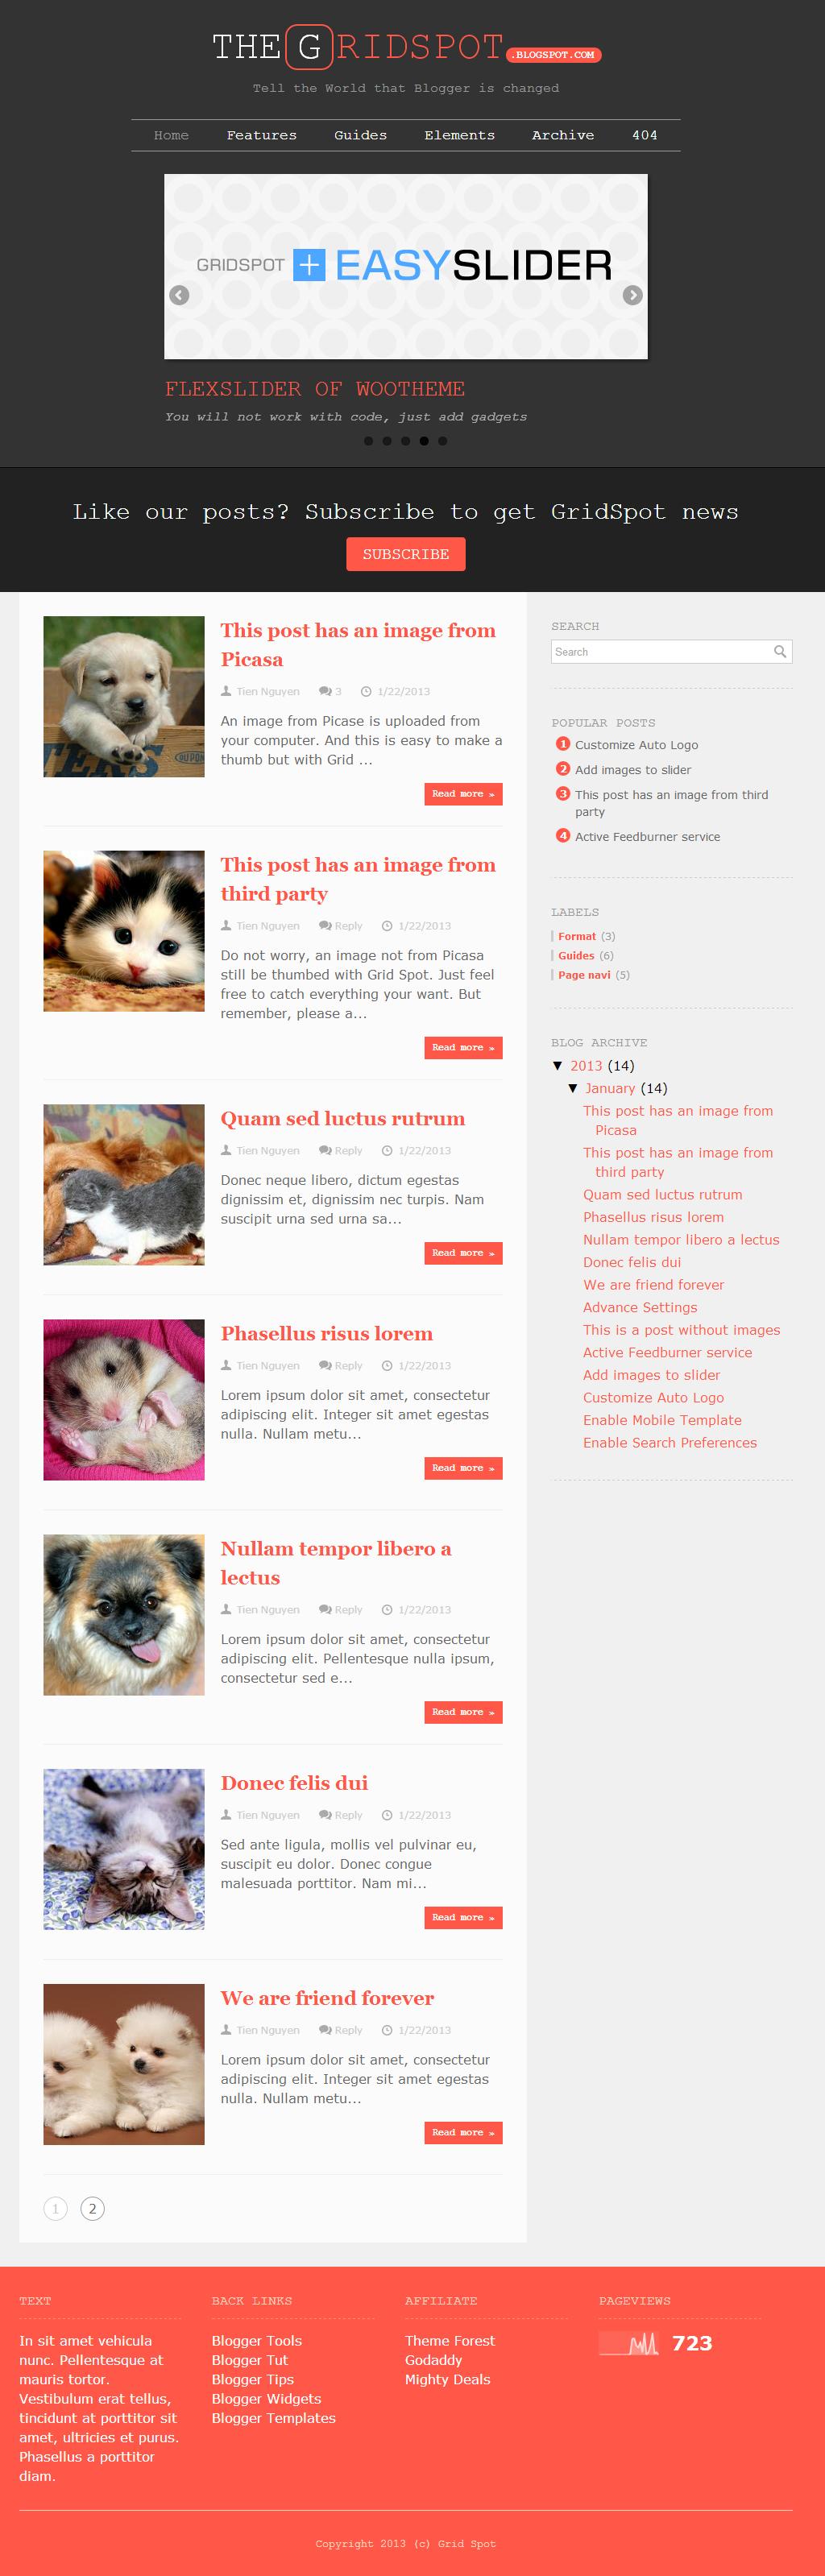 http://3.s3.envato.com/files/57275008/grid_spot_preview_files/02_grid_spot_home_page.jpg